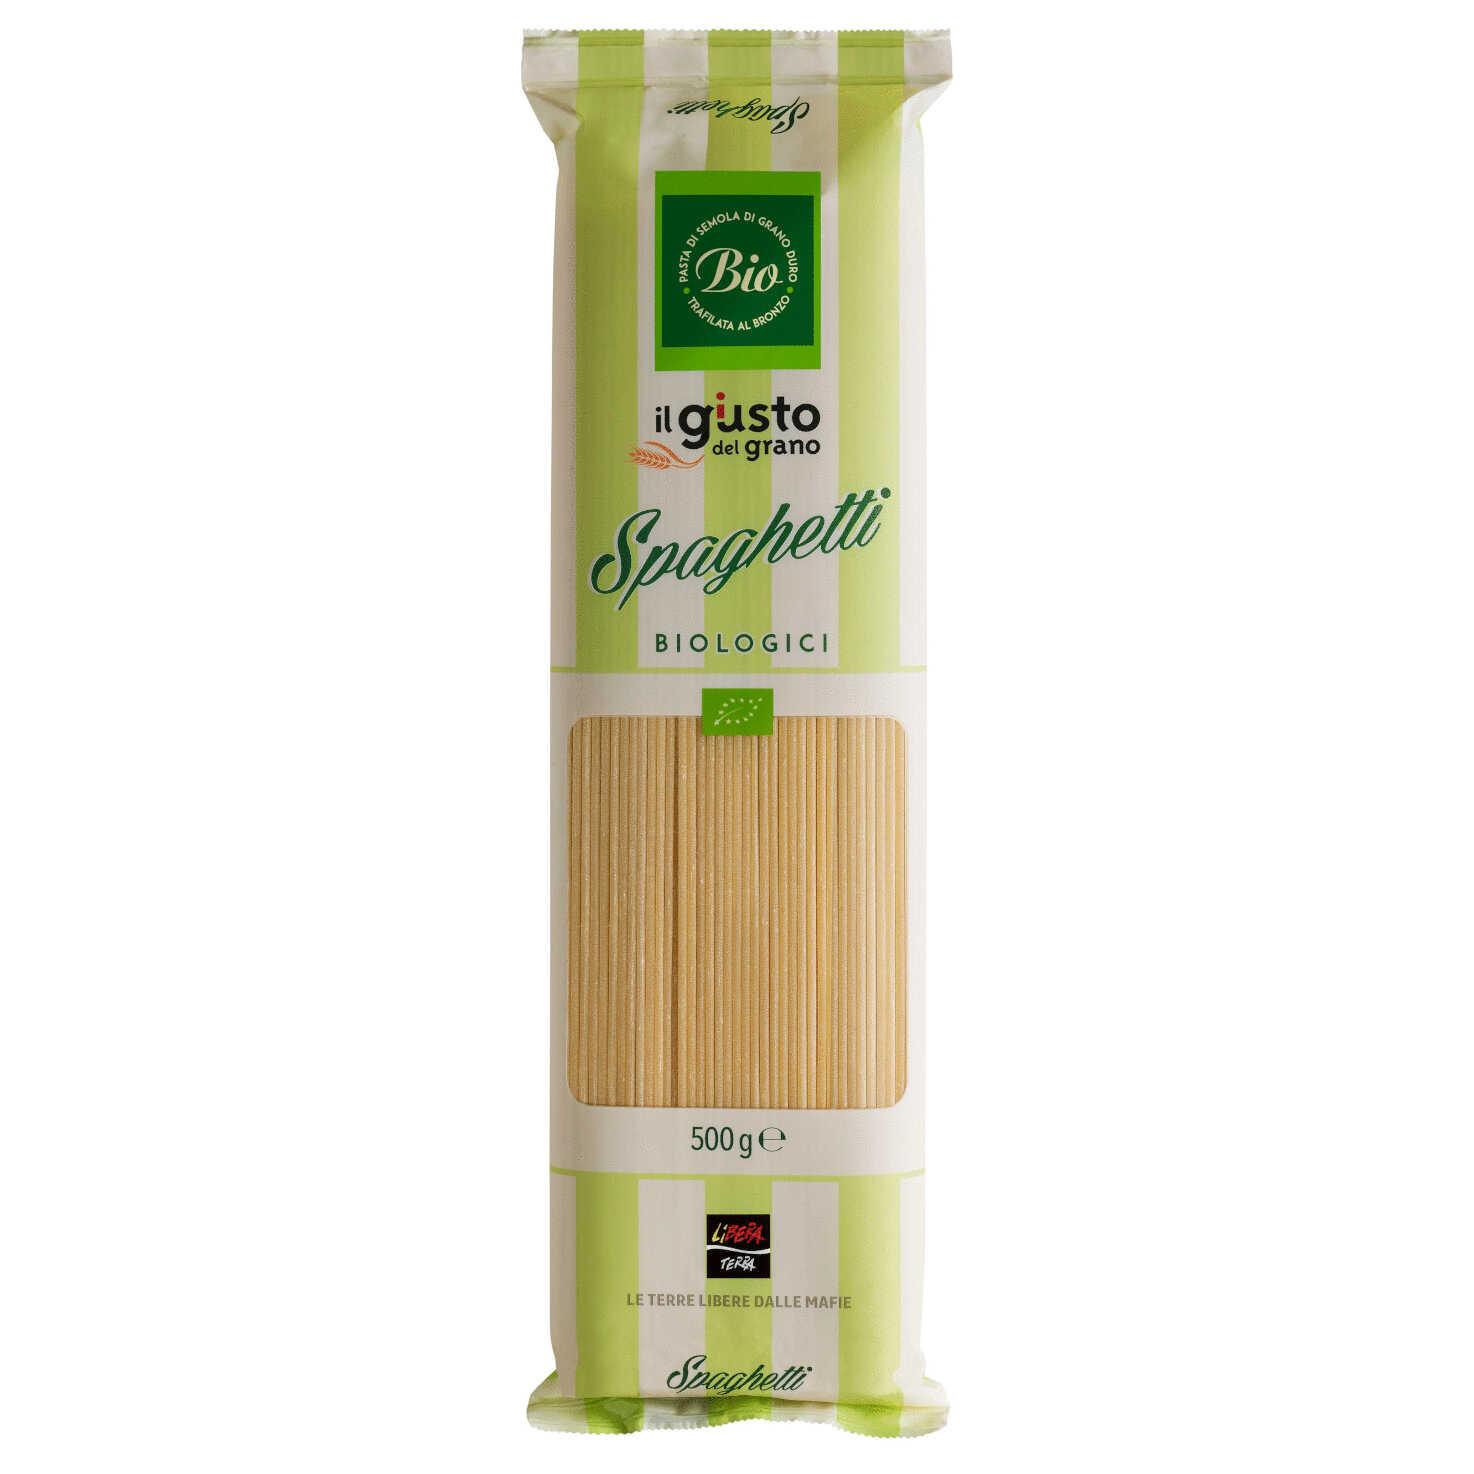 Spaghetti Biologici 500g